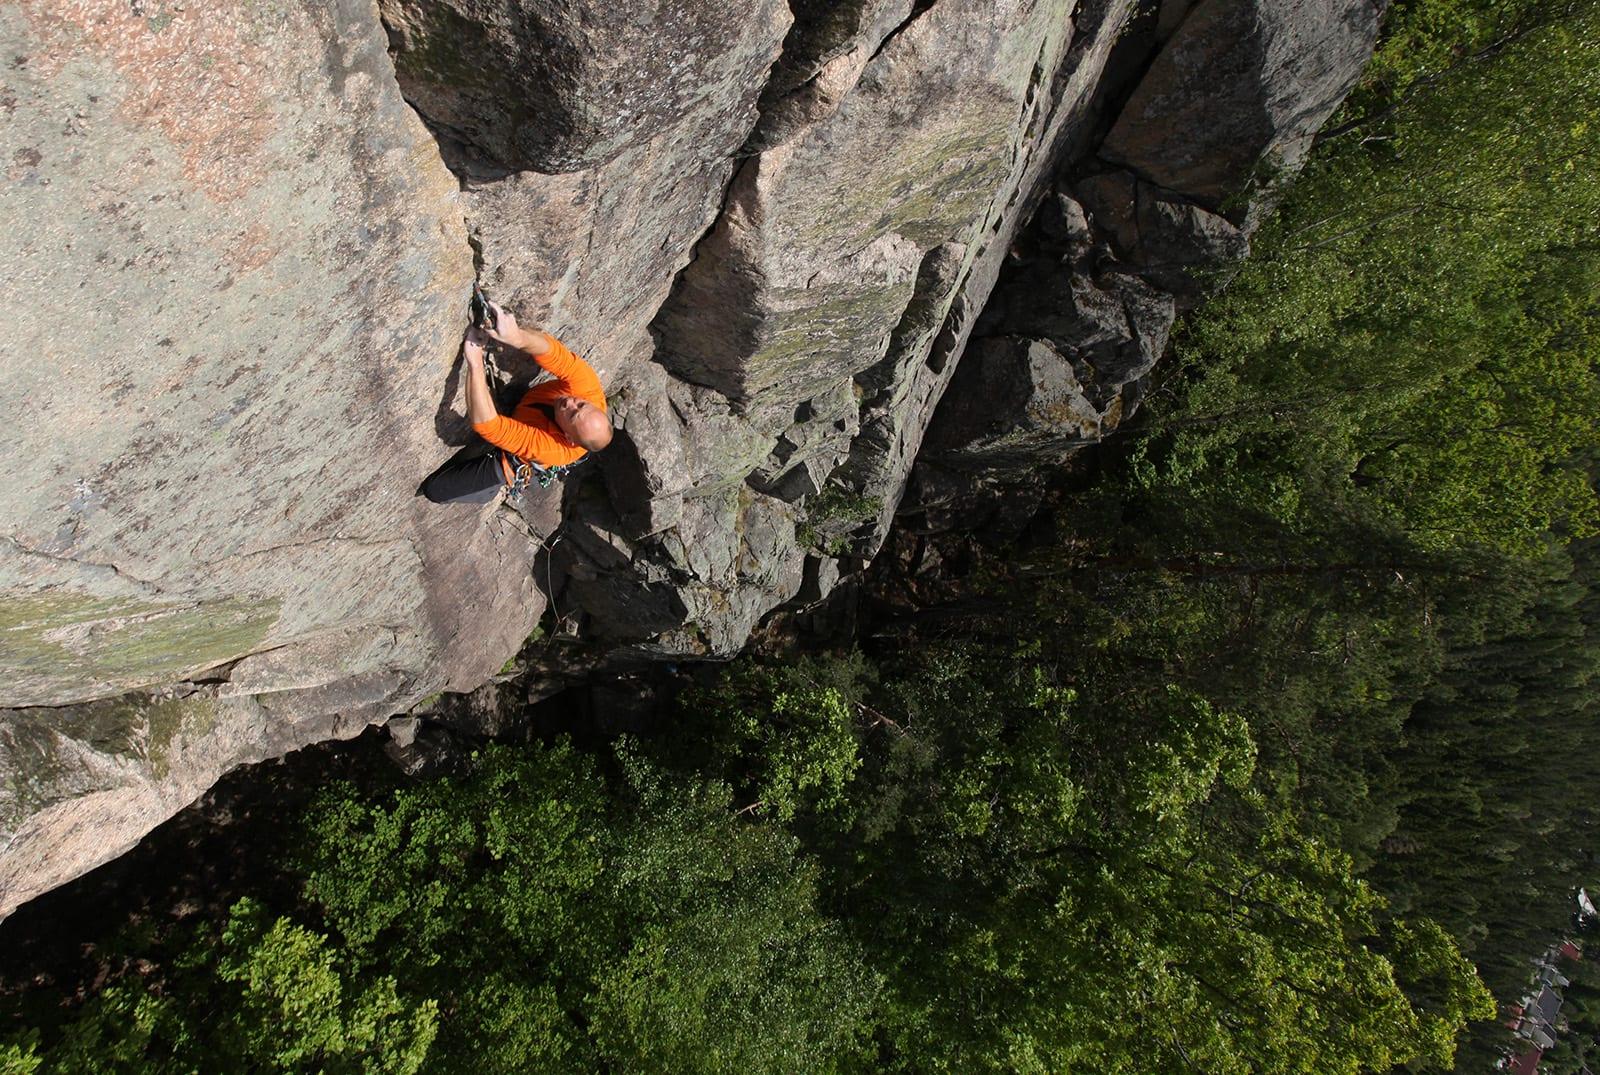 HISTORISK: Fandens hekletøy markerer på et vis starten på teknisk klatring i Norge. Klatrer: Dag Hagen. Foto Erik Neergaard